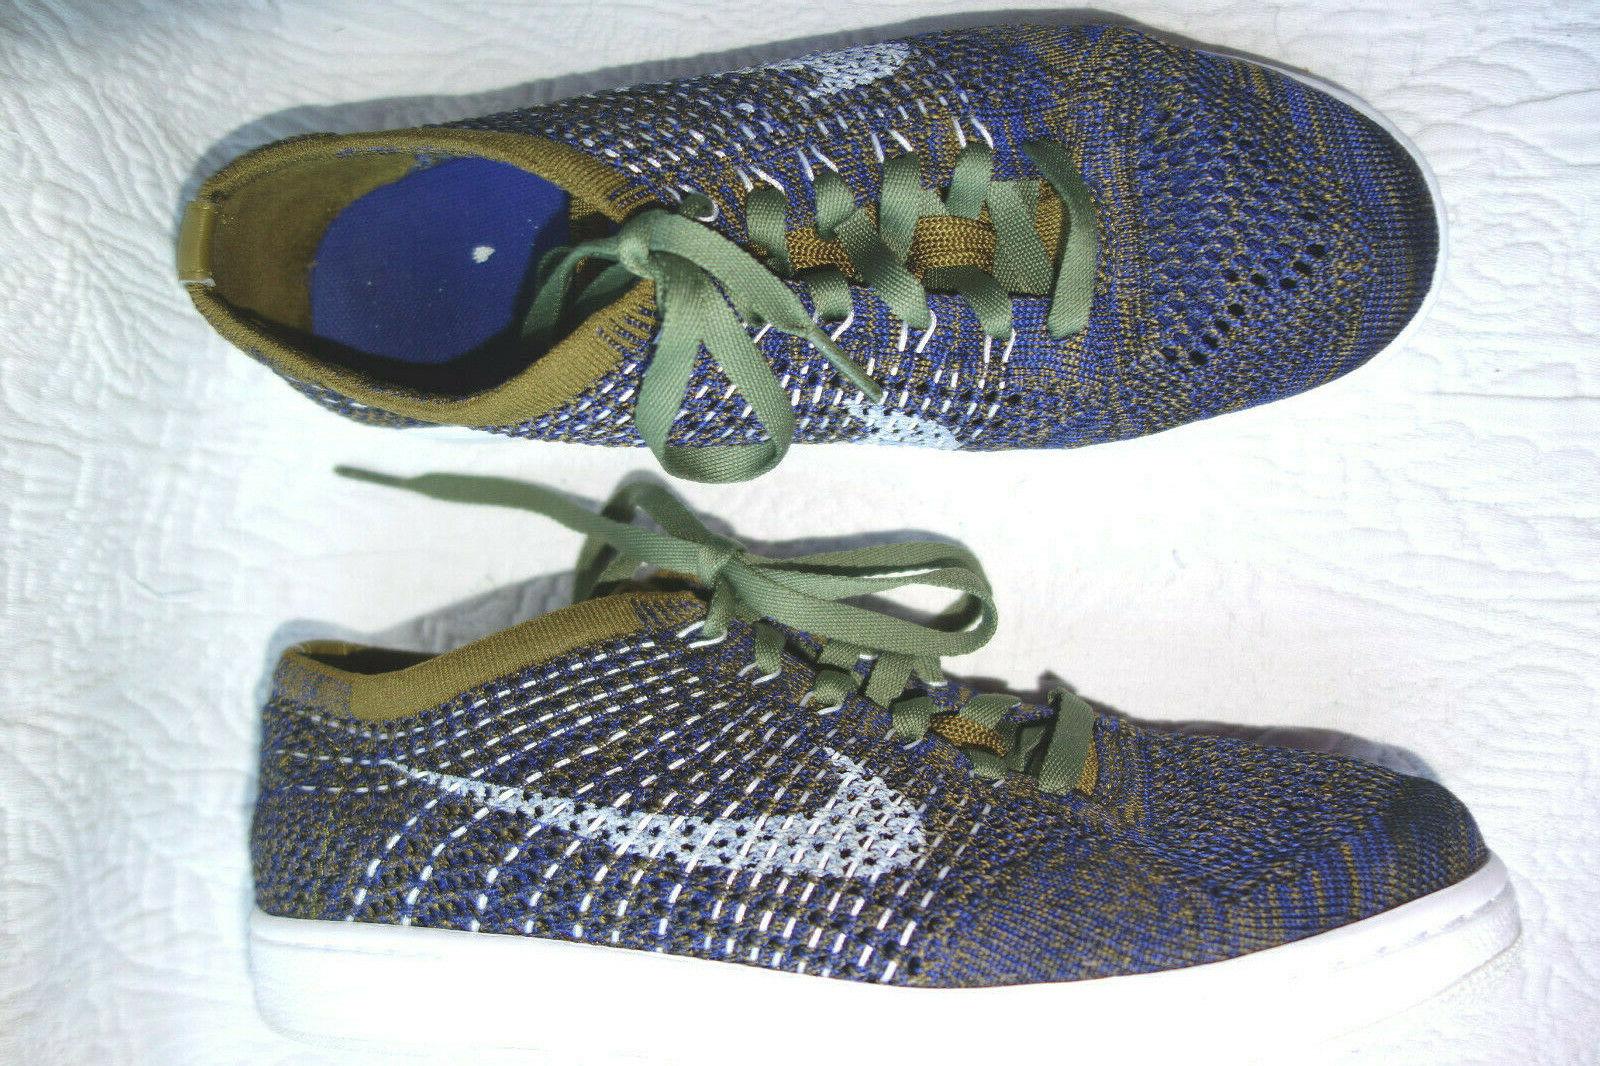 NikeTennis Classic  40 (39)  25,5 cm blau olivgrün Turnschuhe Mesh fast neu Neuartiges Design